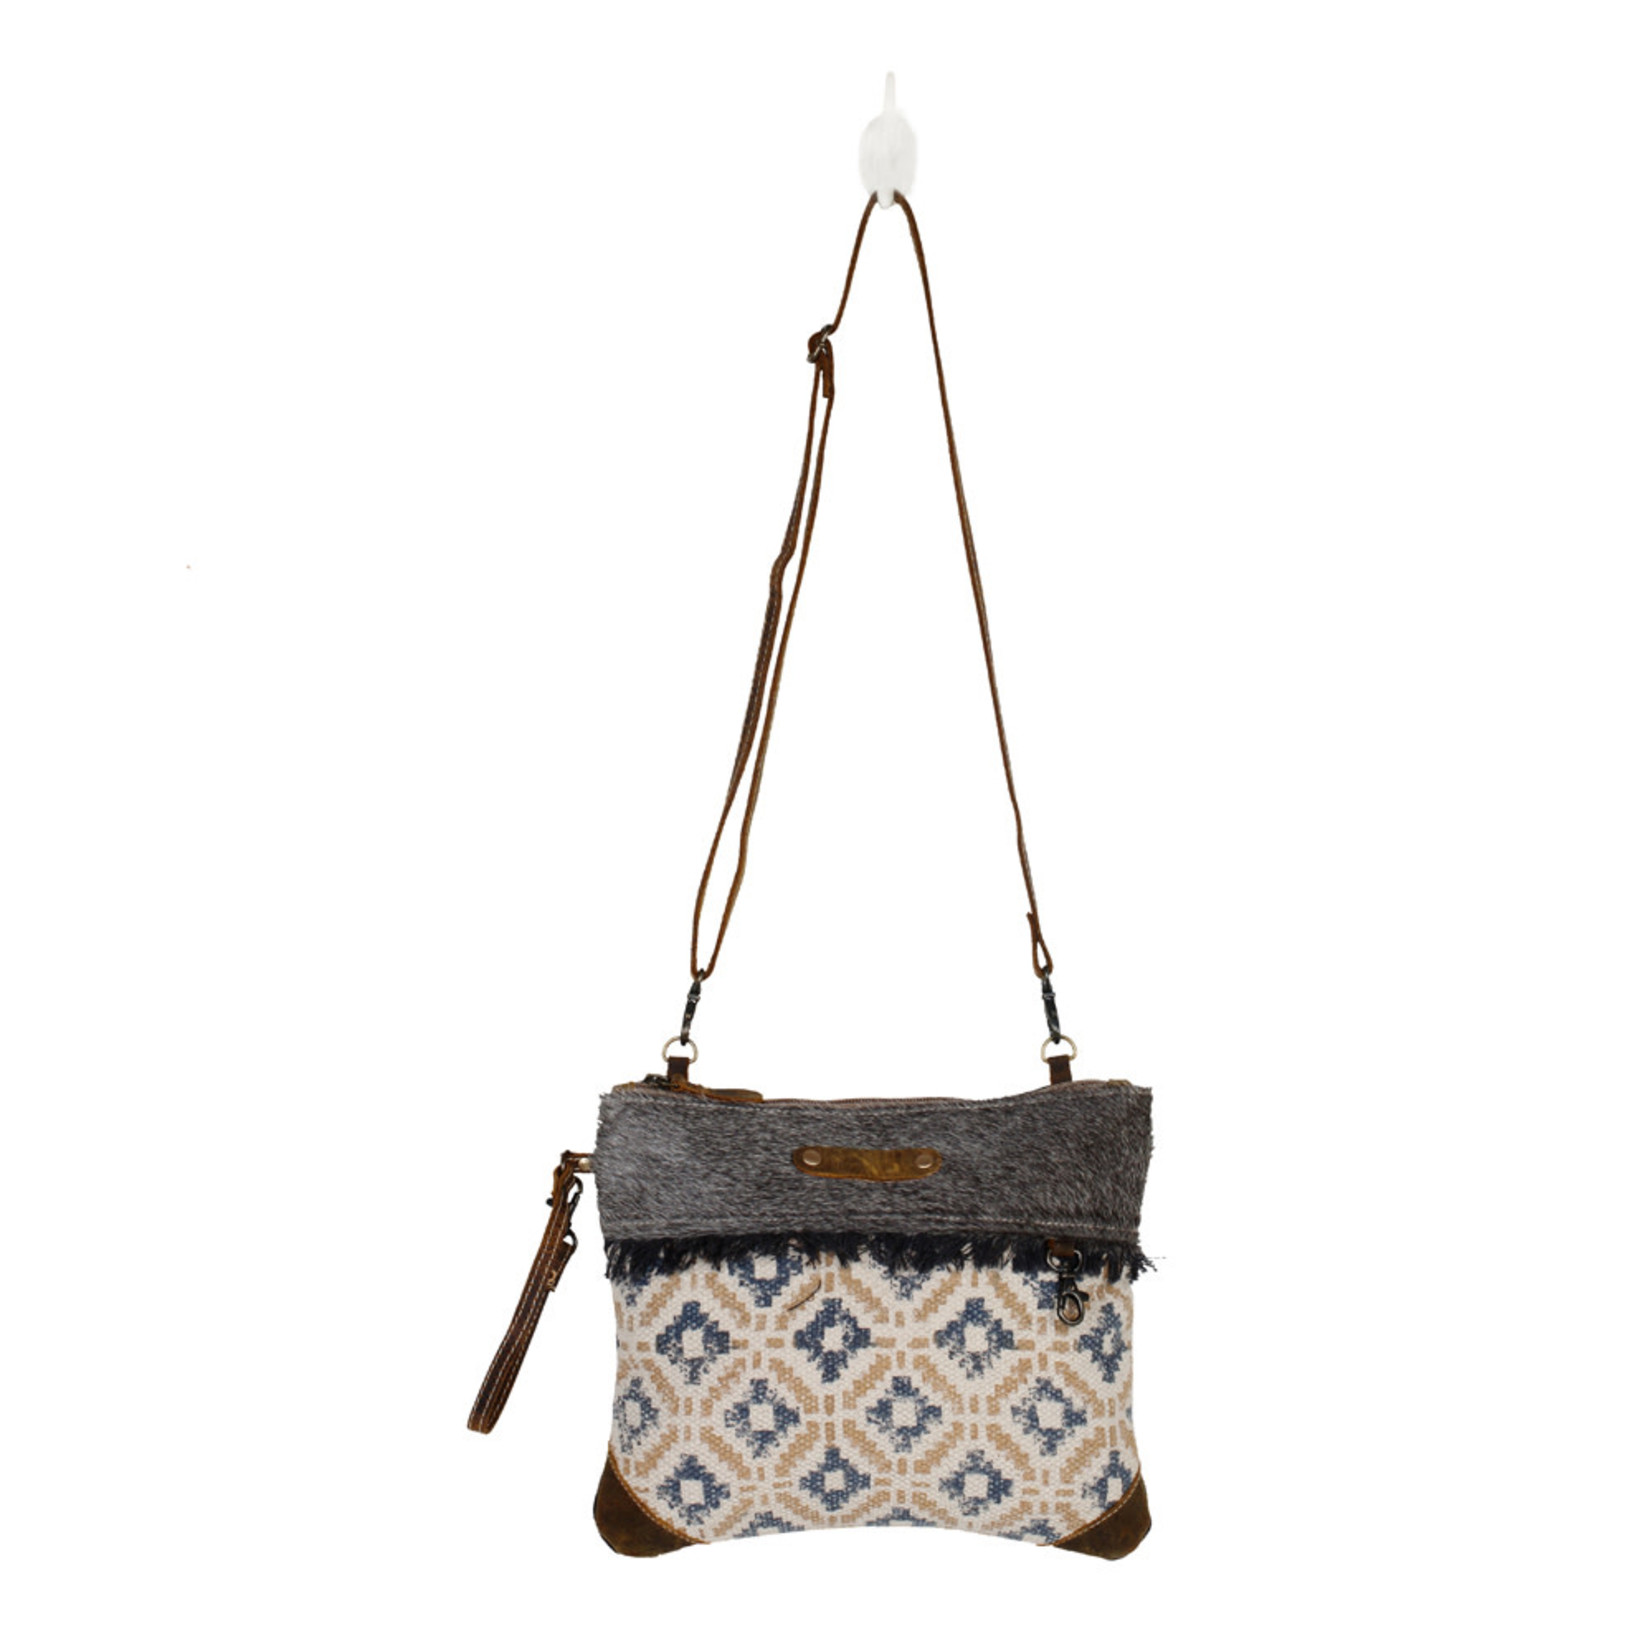 Myra Bags S-2540 Pixels Small Crossbody Bag